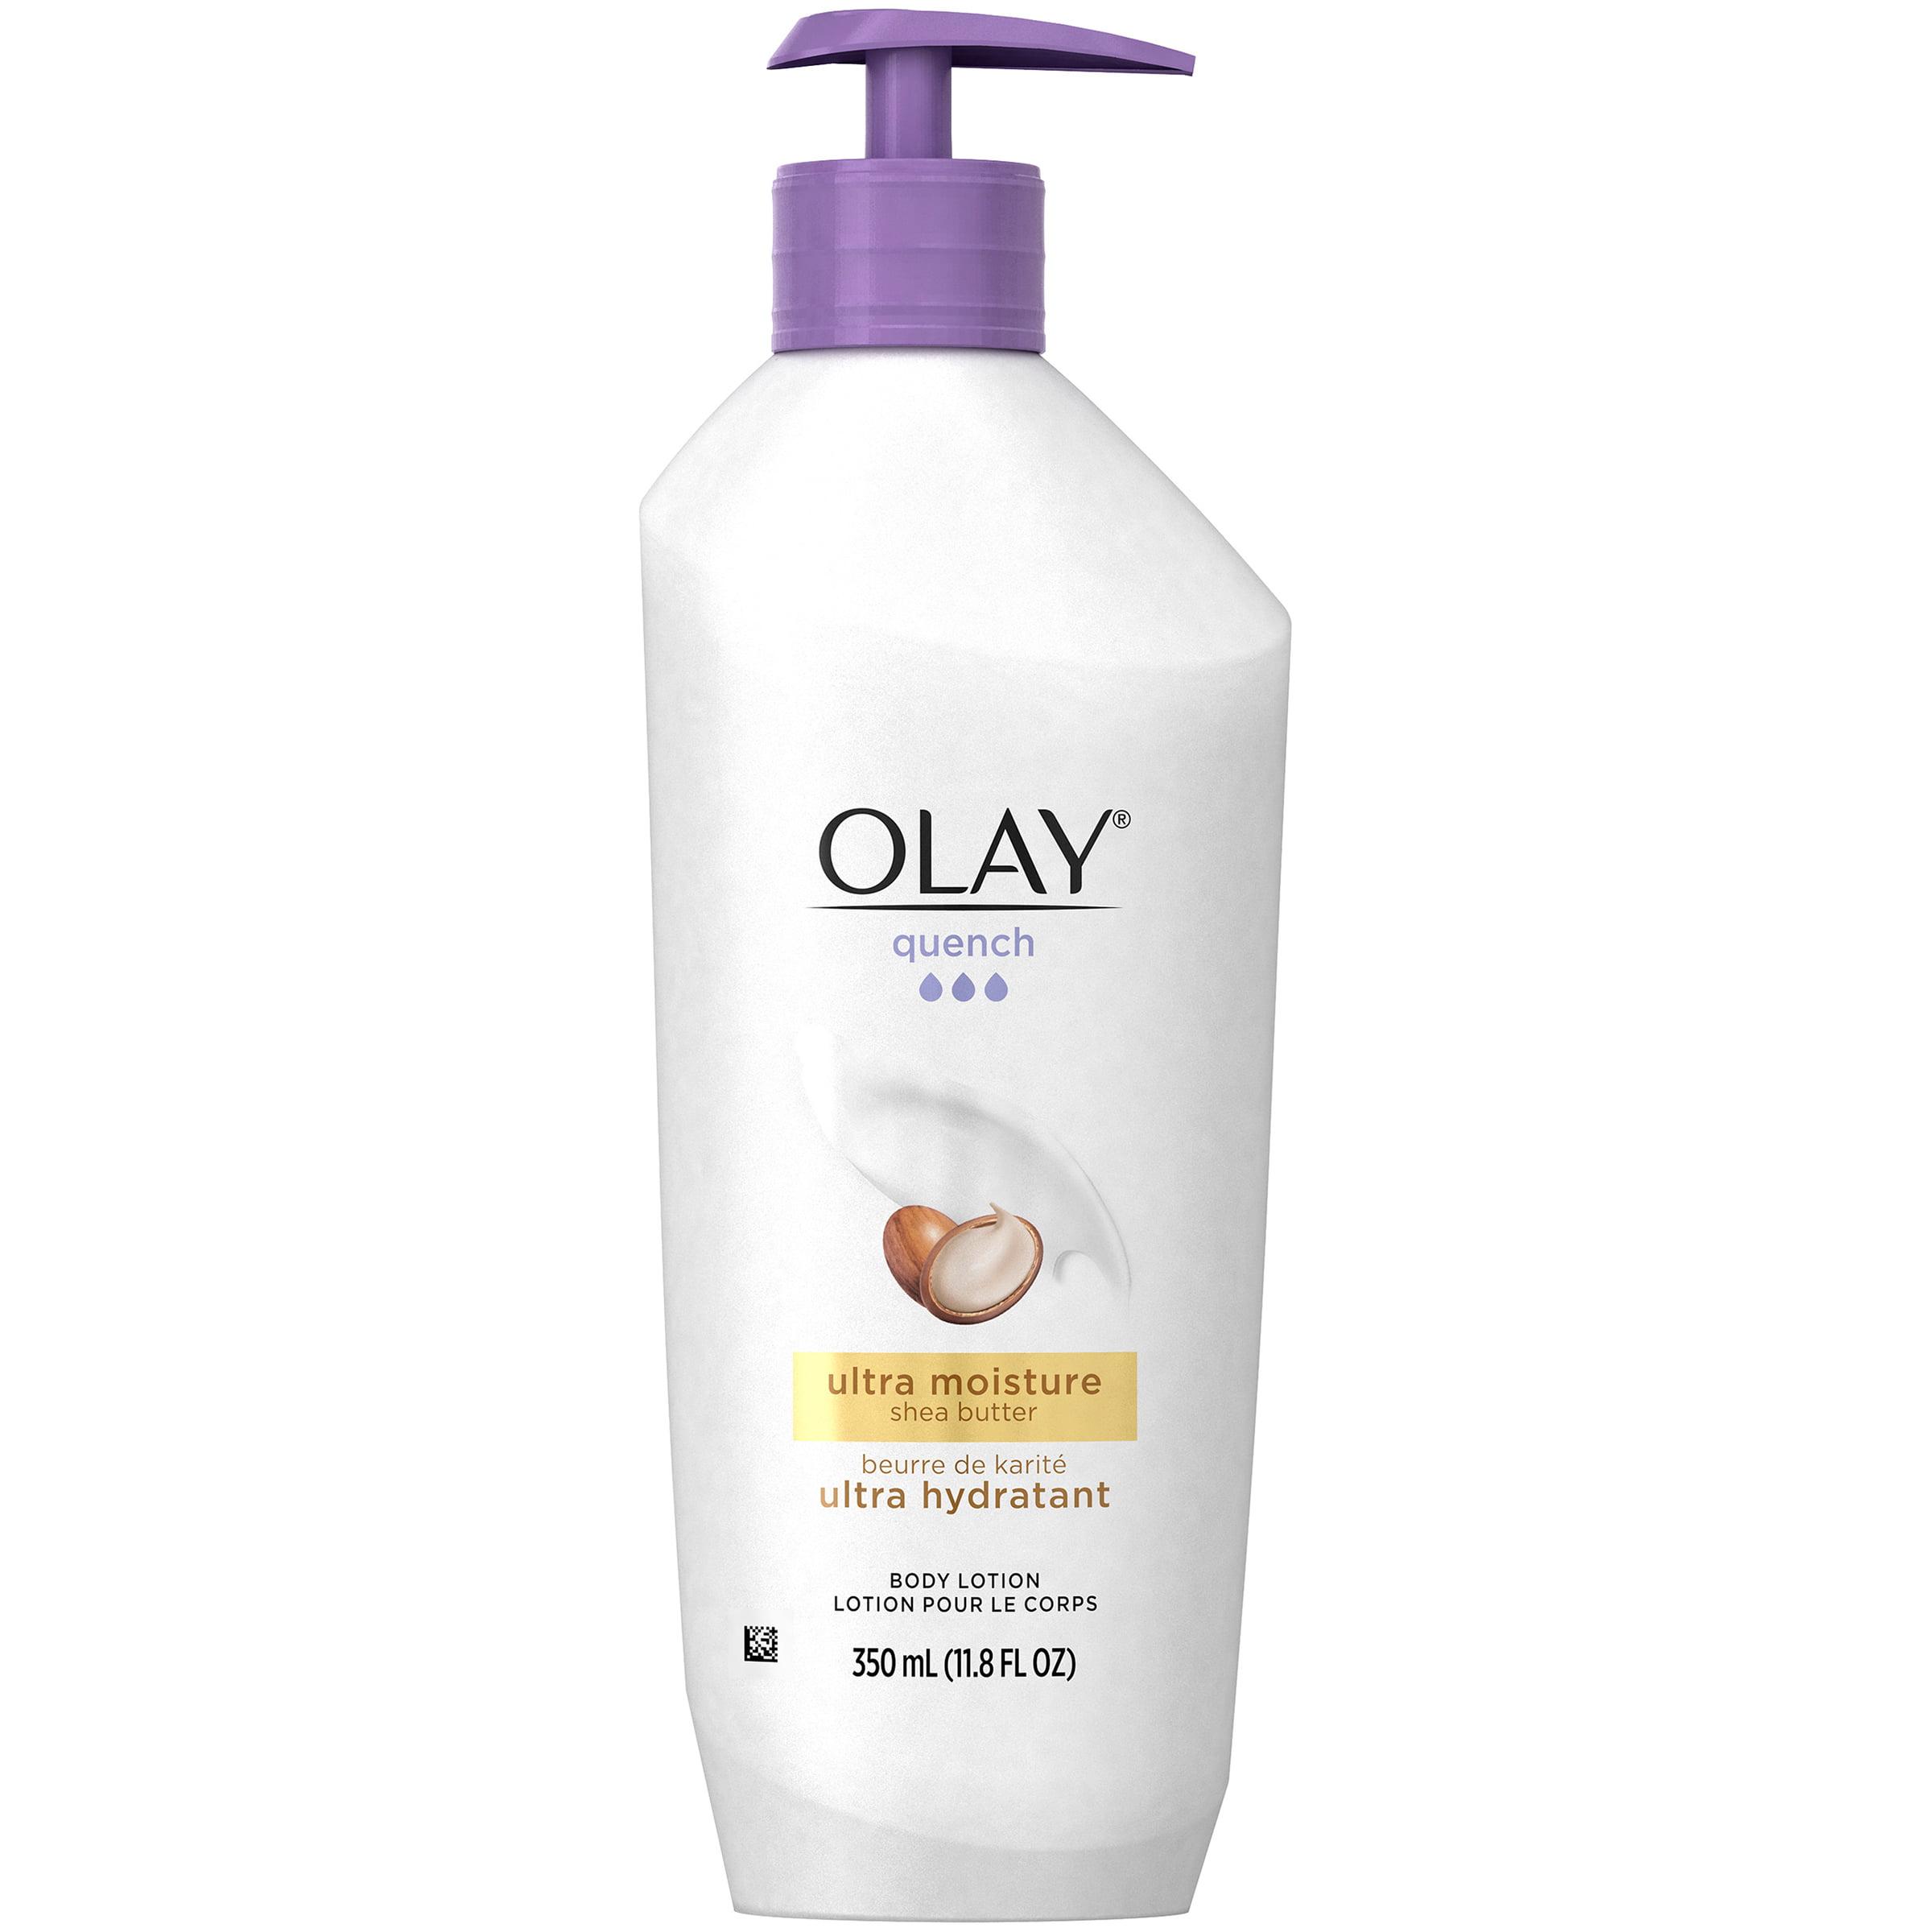 Olay® Quench Ultra Moisture Shea Butter Body Lotion 11.8 fl. oz. Pump